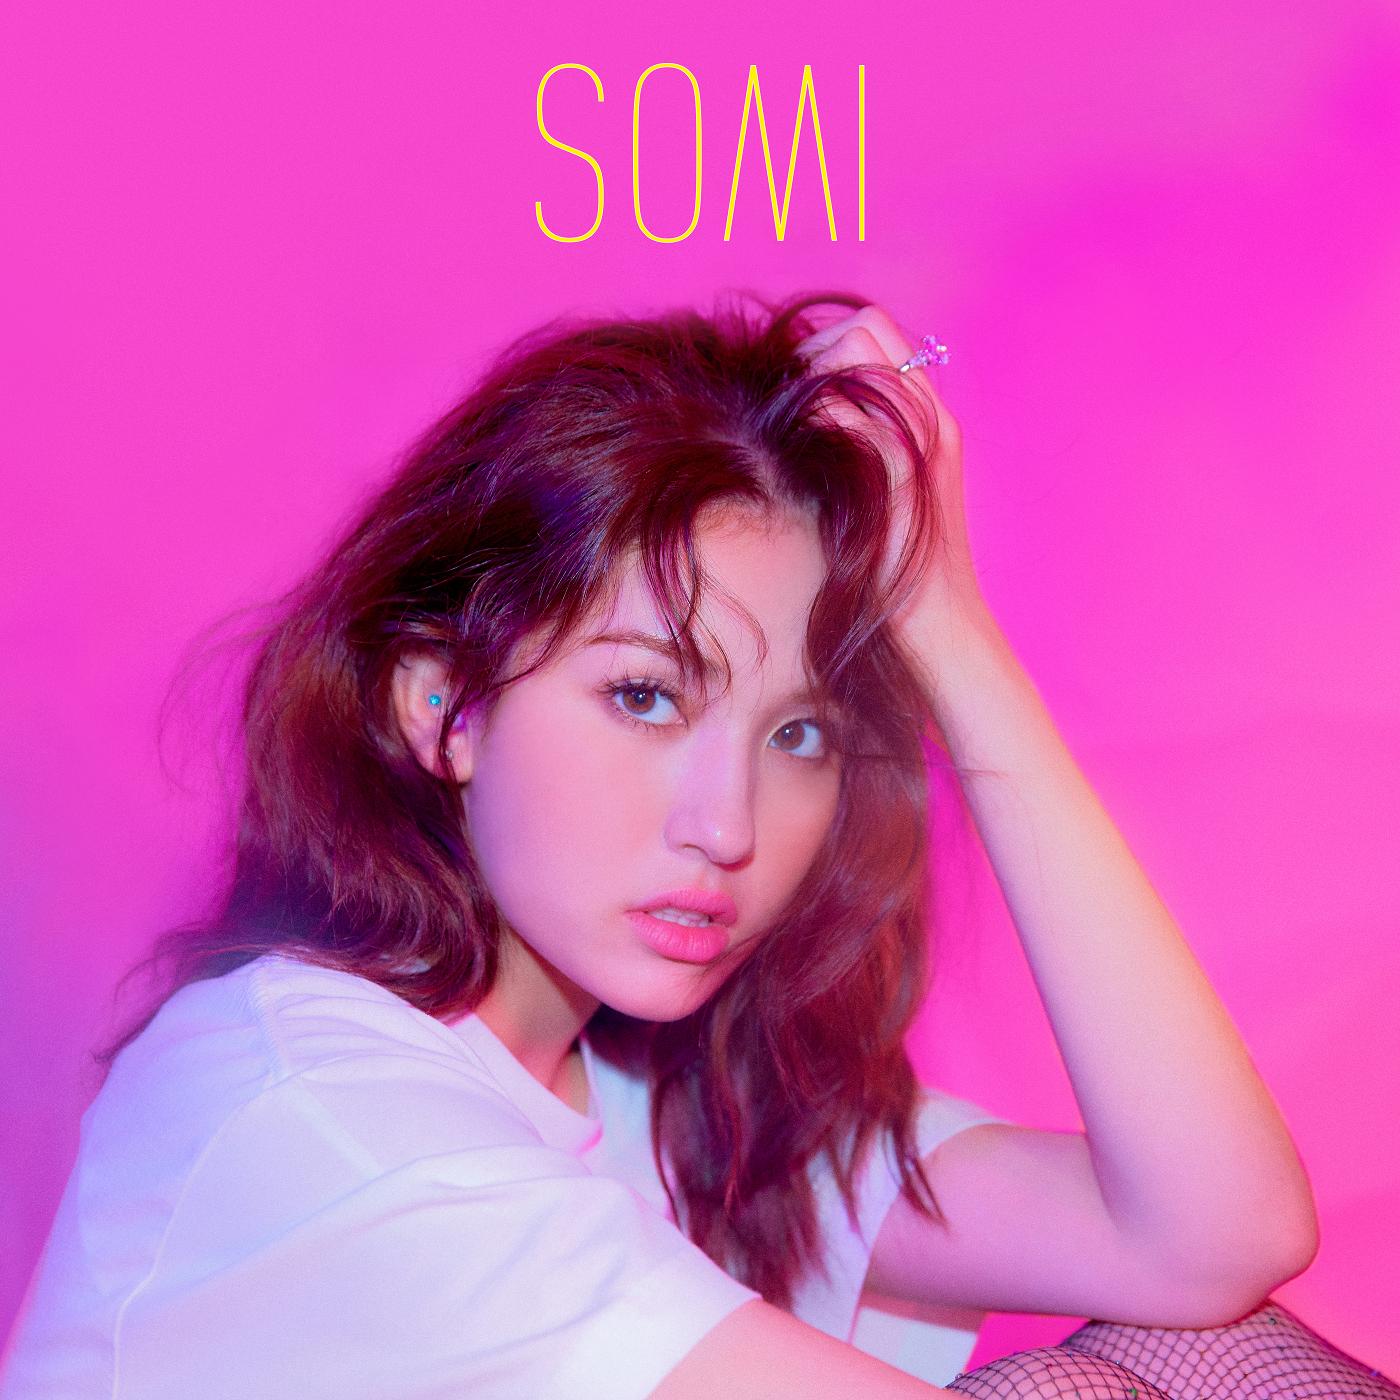 Birthday (Соми)